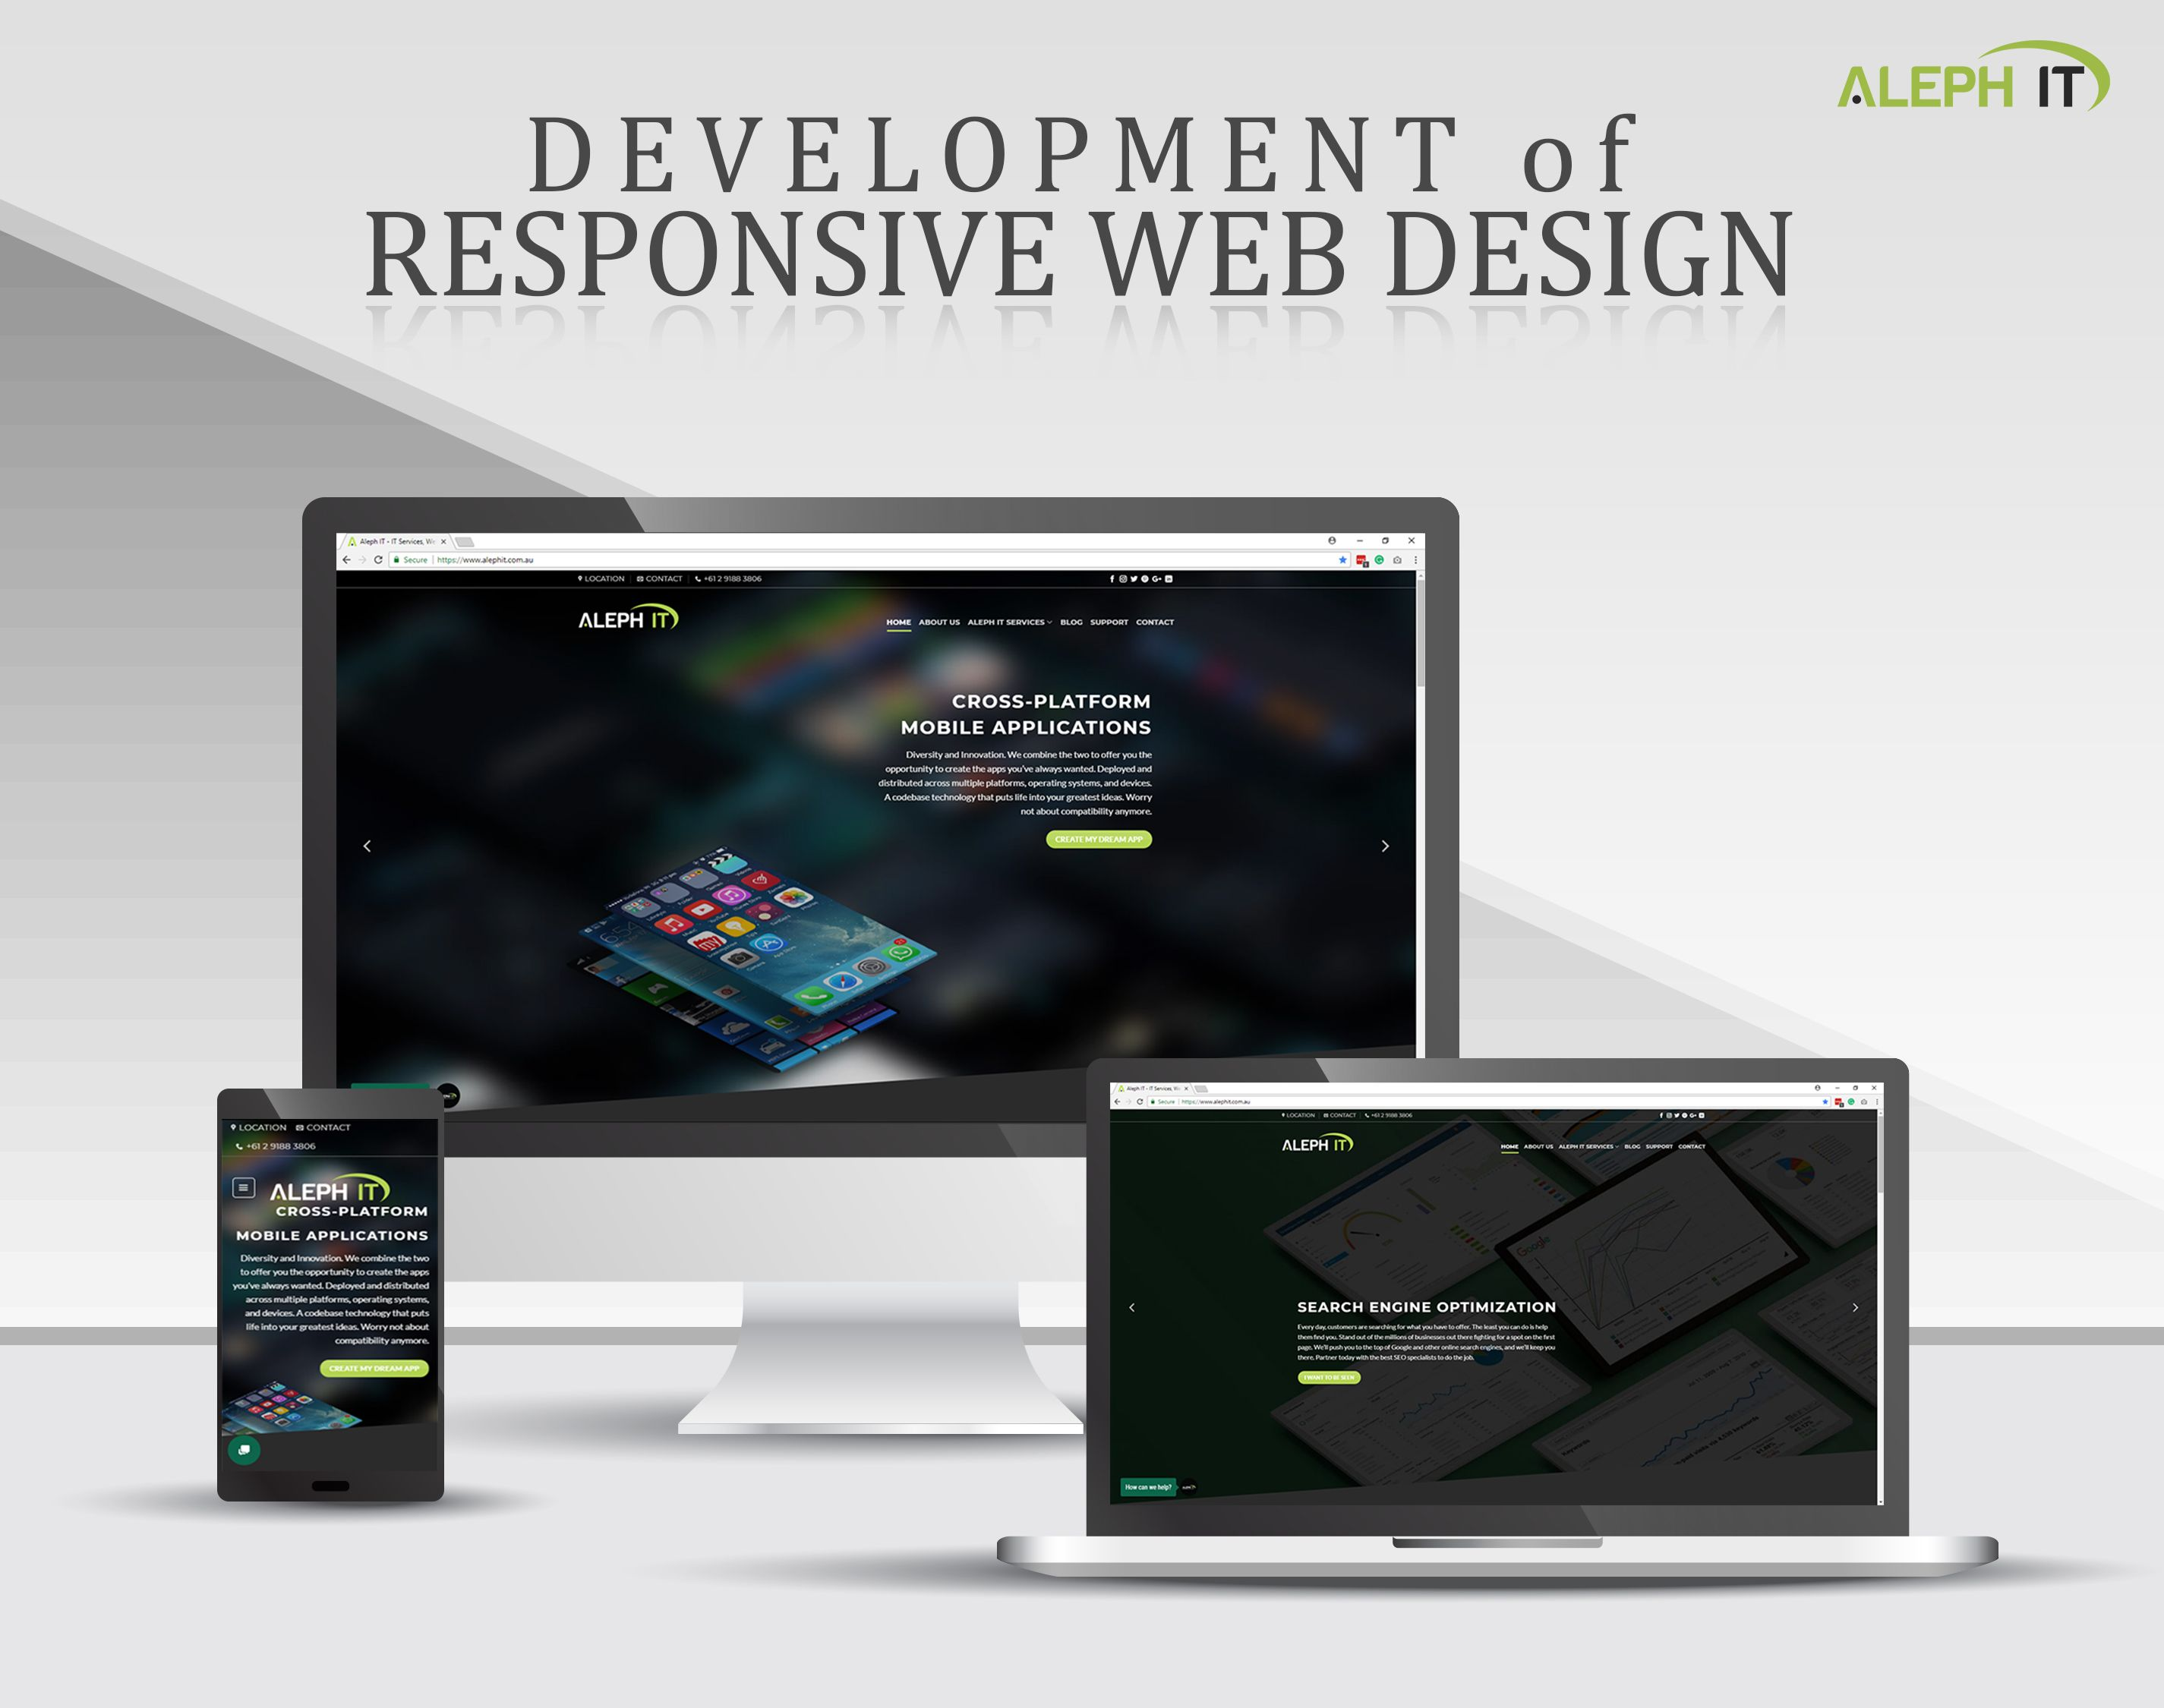 Responsive Web Design Sydney With Images Web Design Responsive Design Digital Business